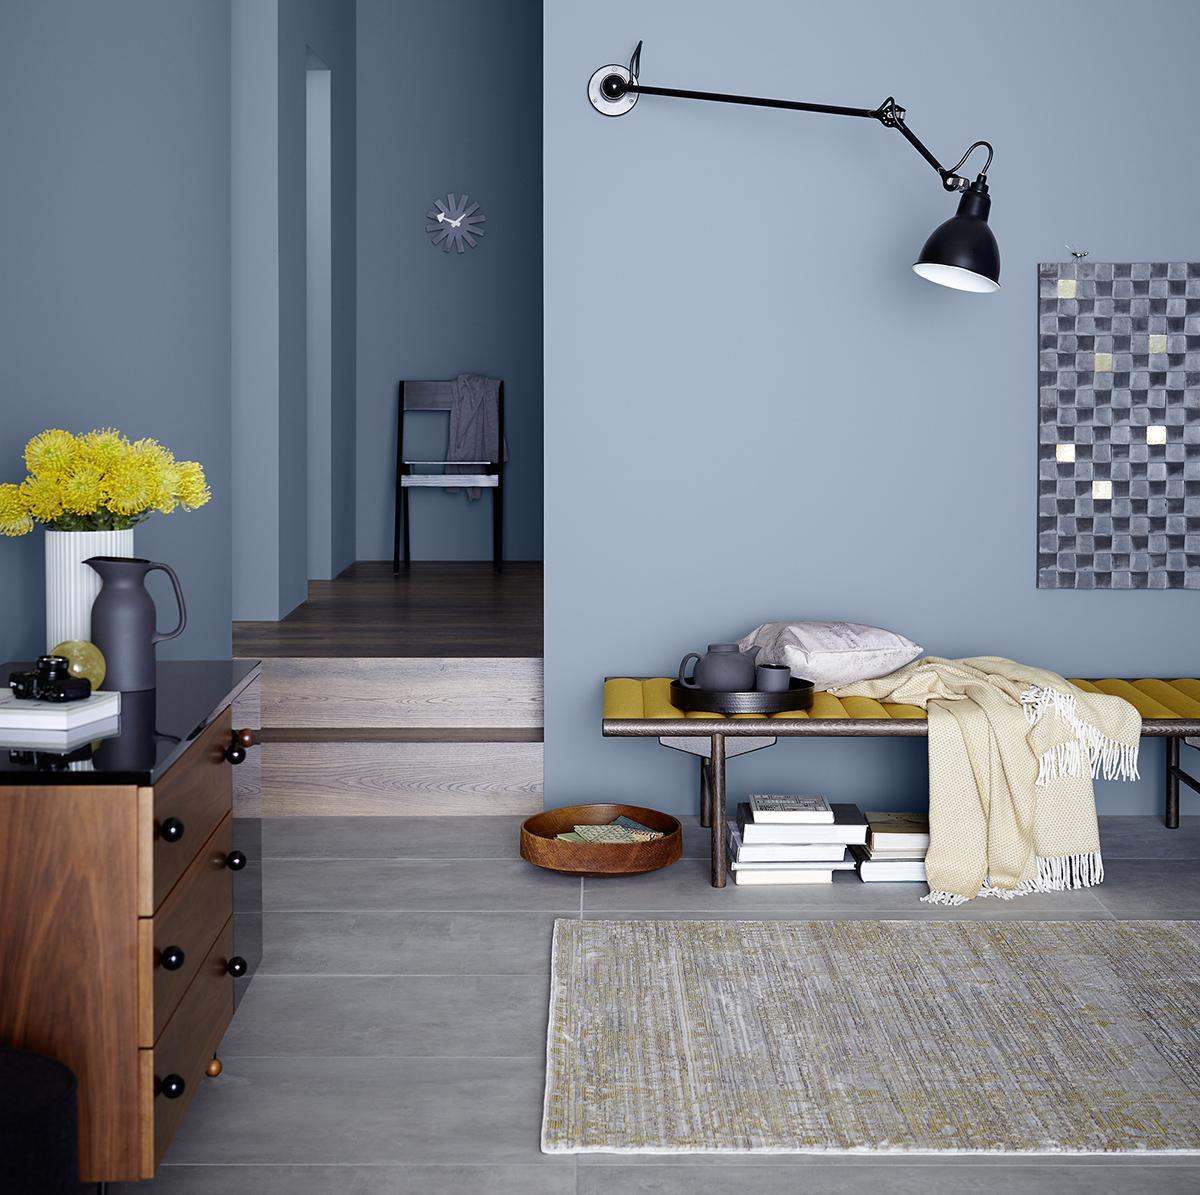 Wandfarbe In Blau • Bilder & Ideen • COUCH